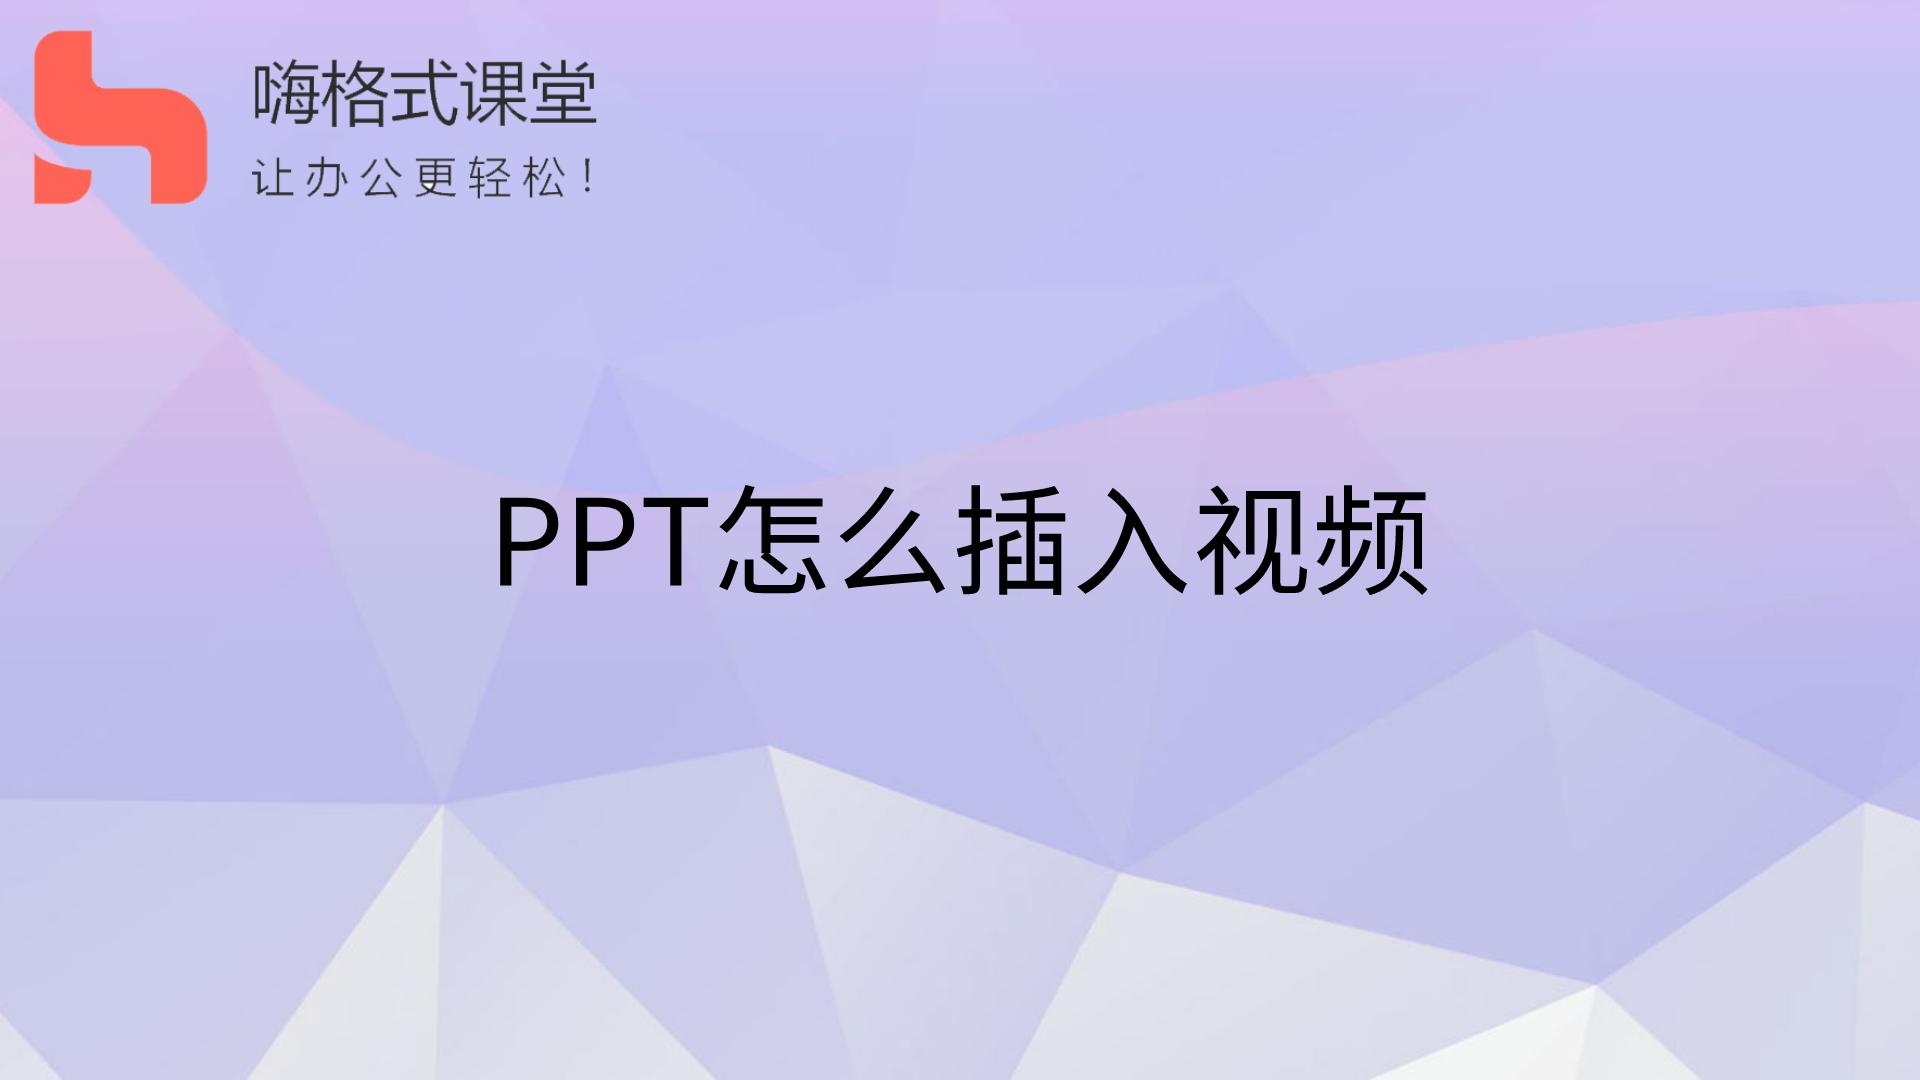 PPT怎么插入视频